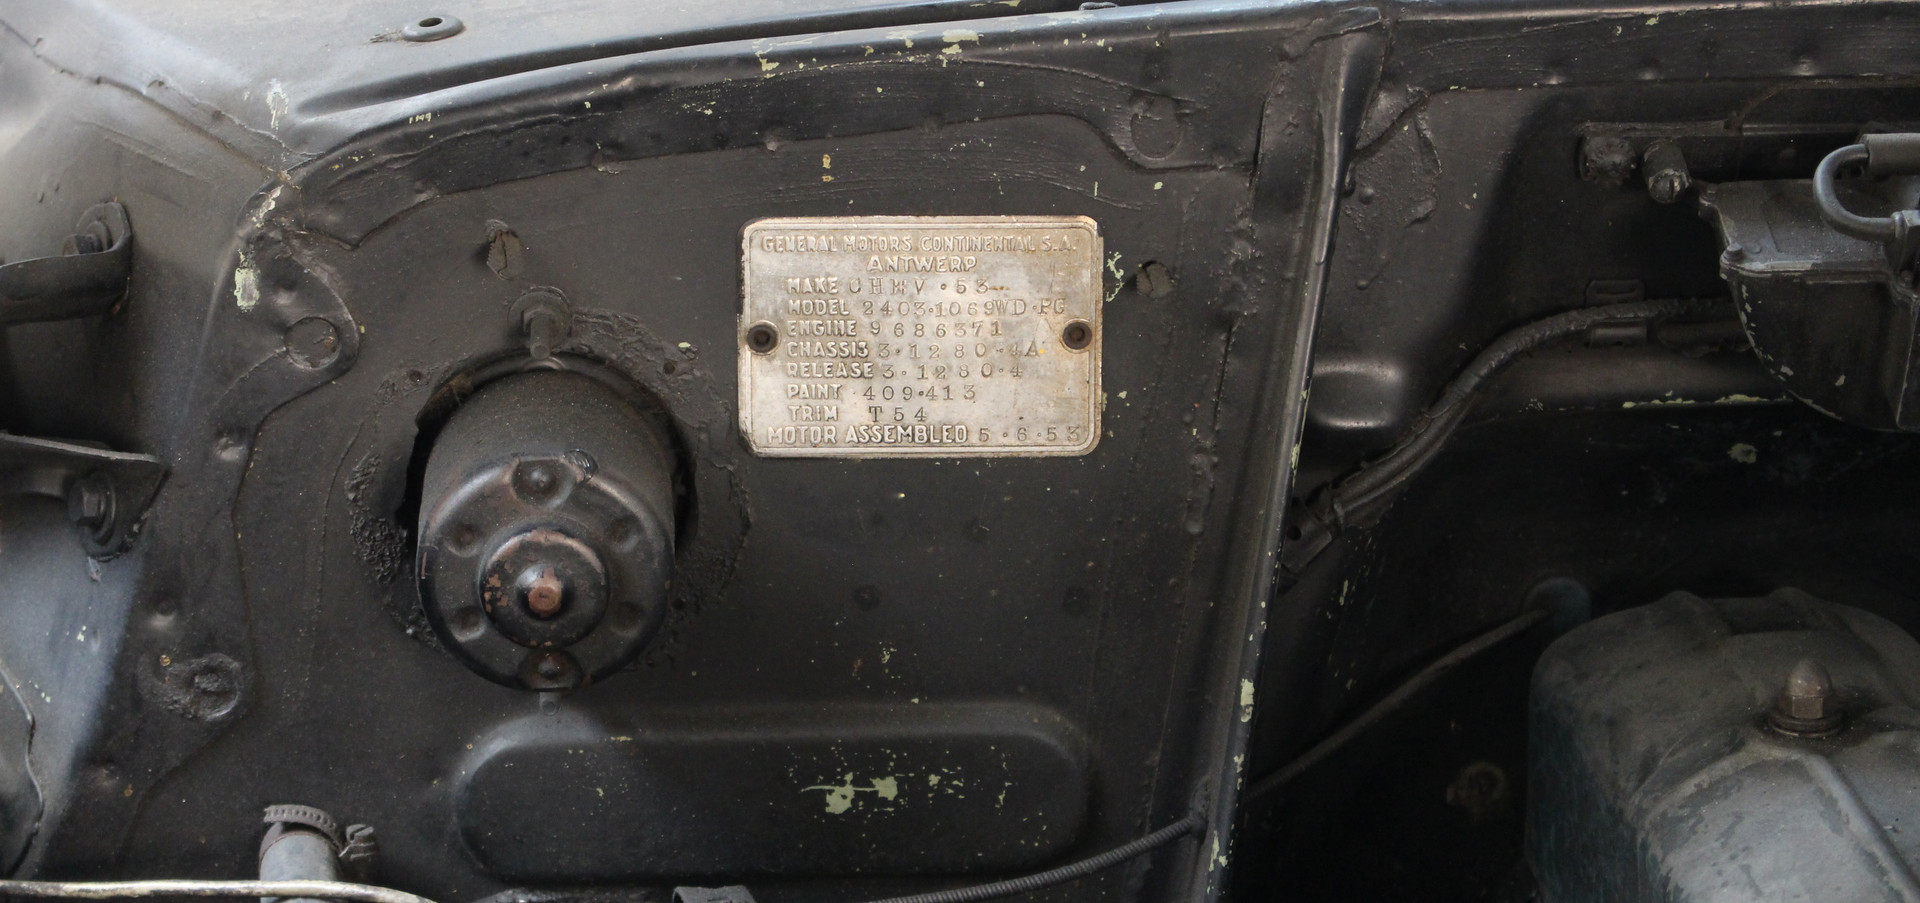 Chevrolet_BelAIr_1953_28.JPG